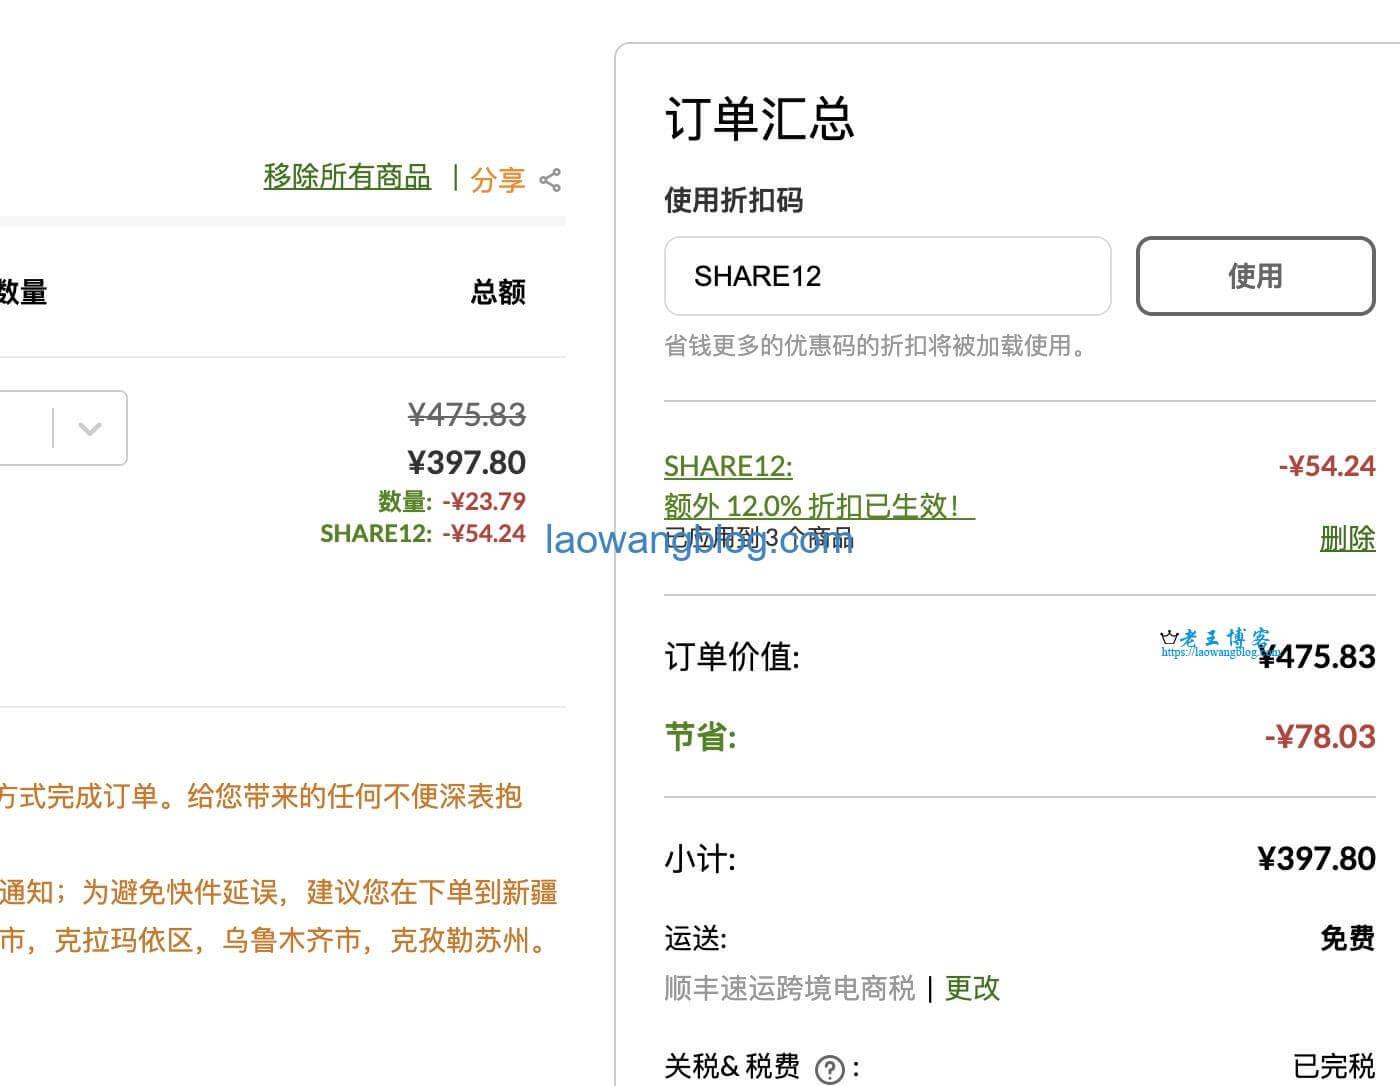 8 月限时 iHerb 促销代码 SHARE12